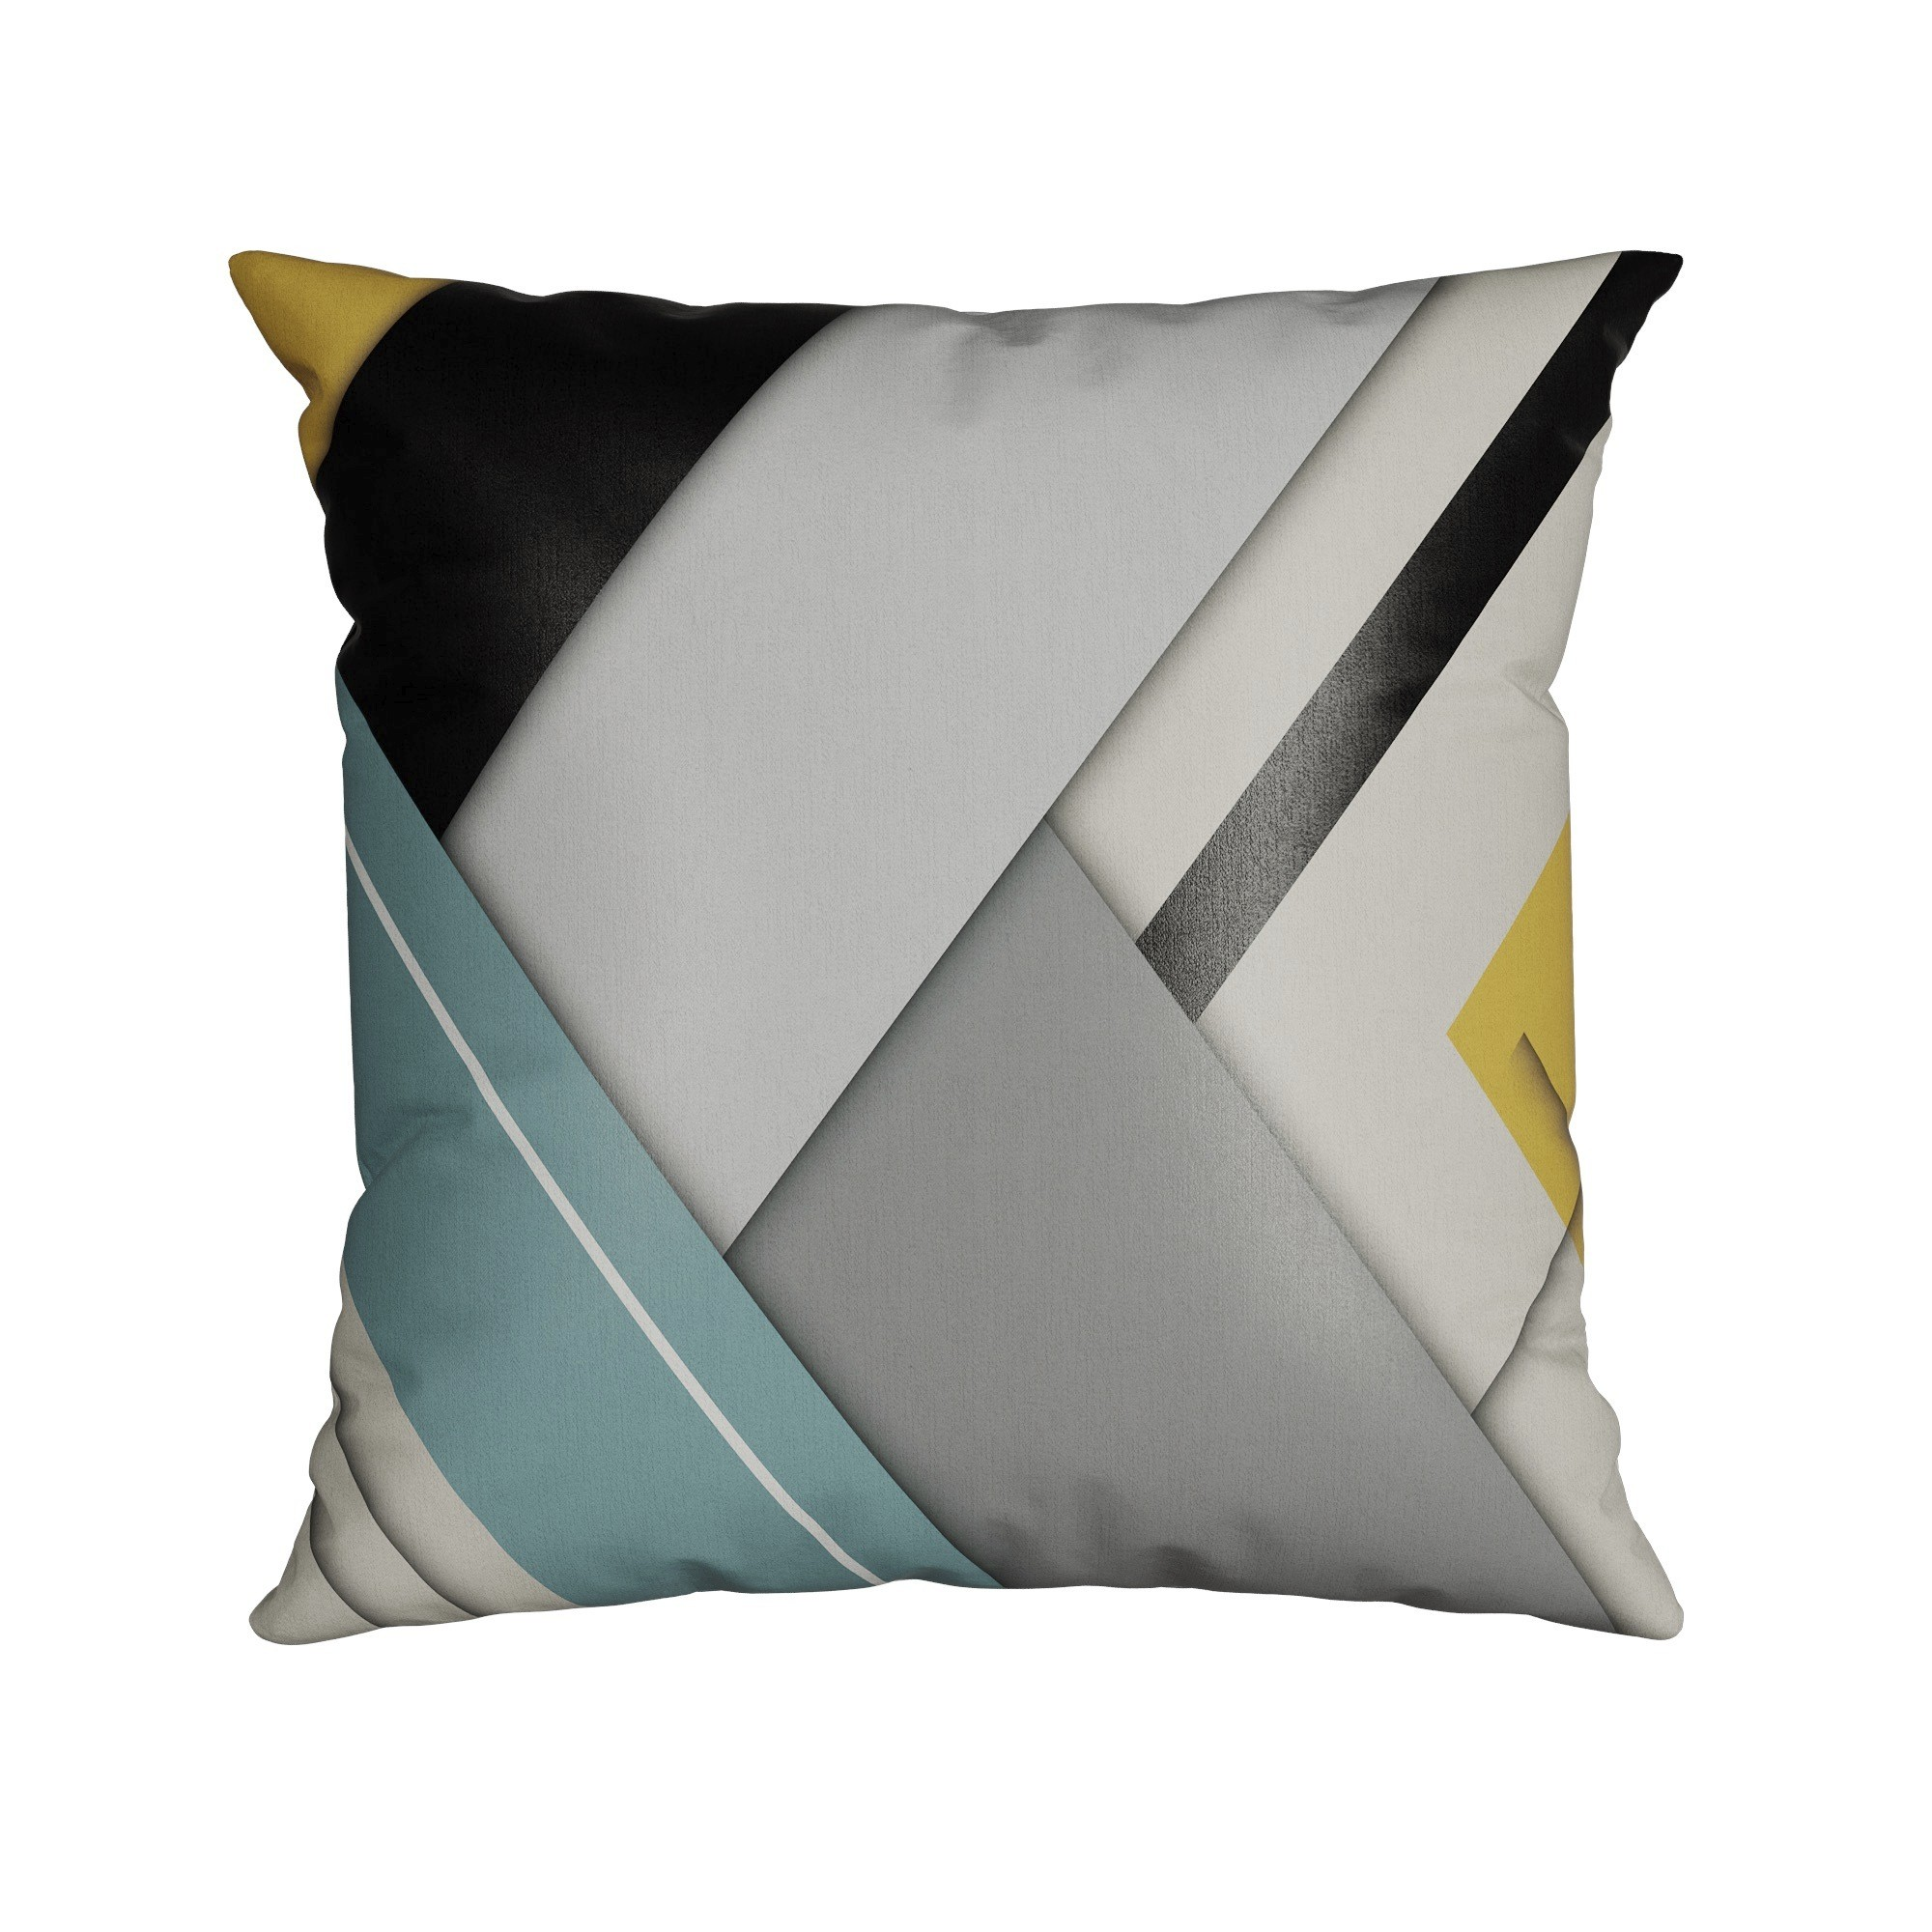 Almofada Silk Home 50x50cm 0493 - Belchior